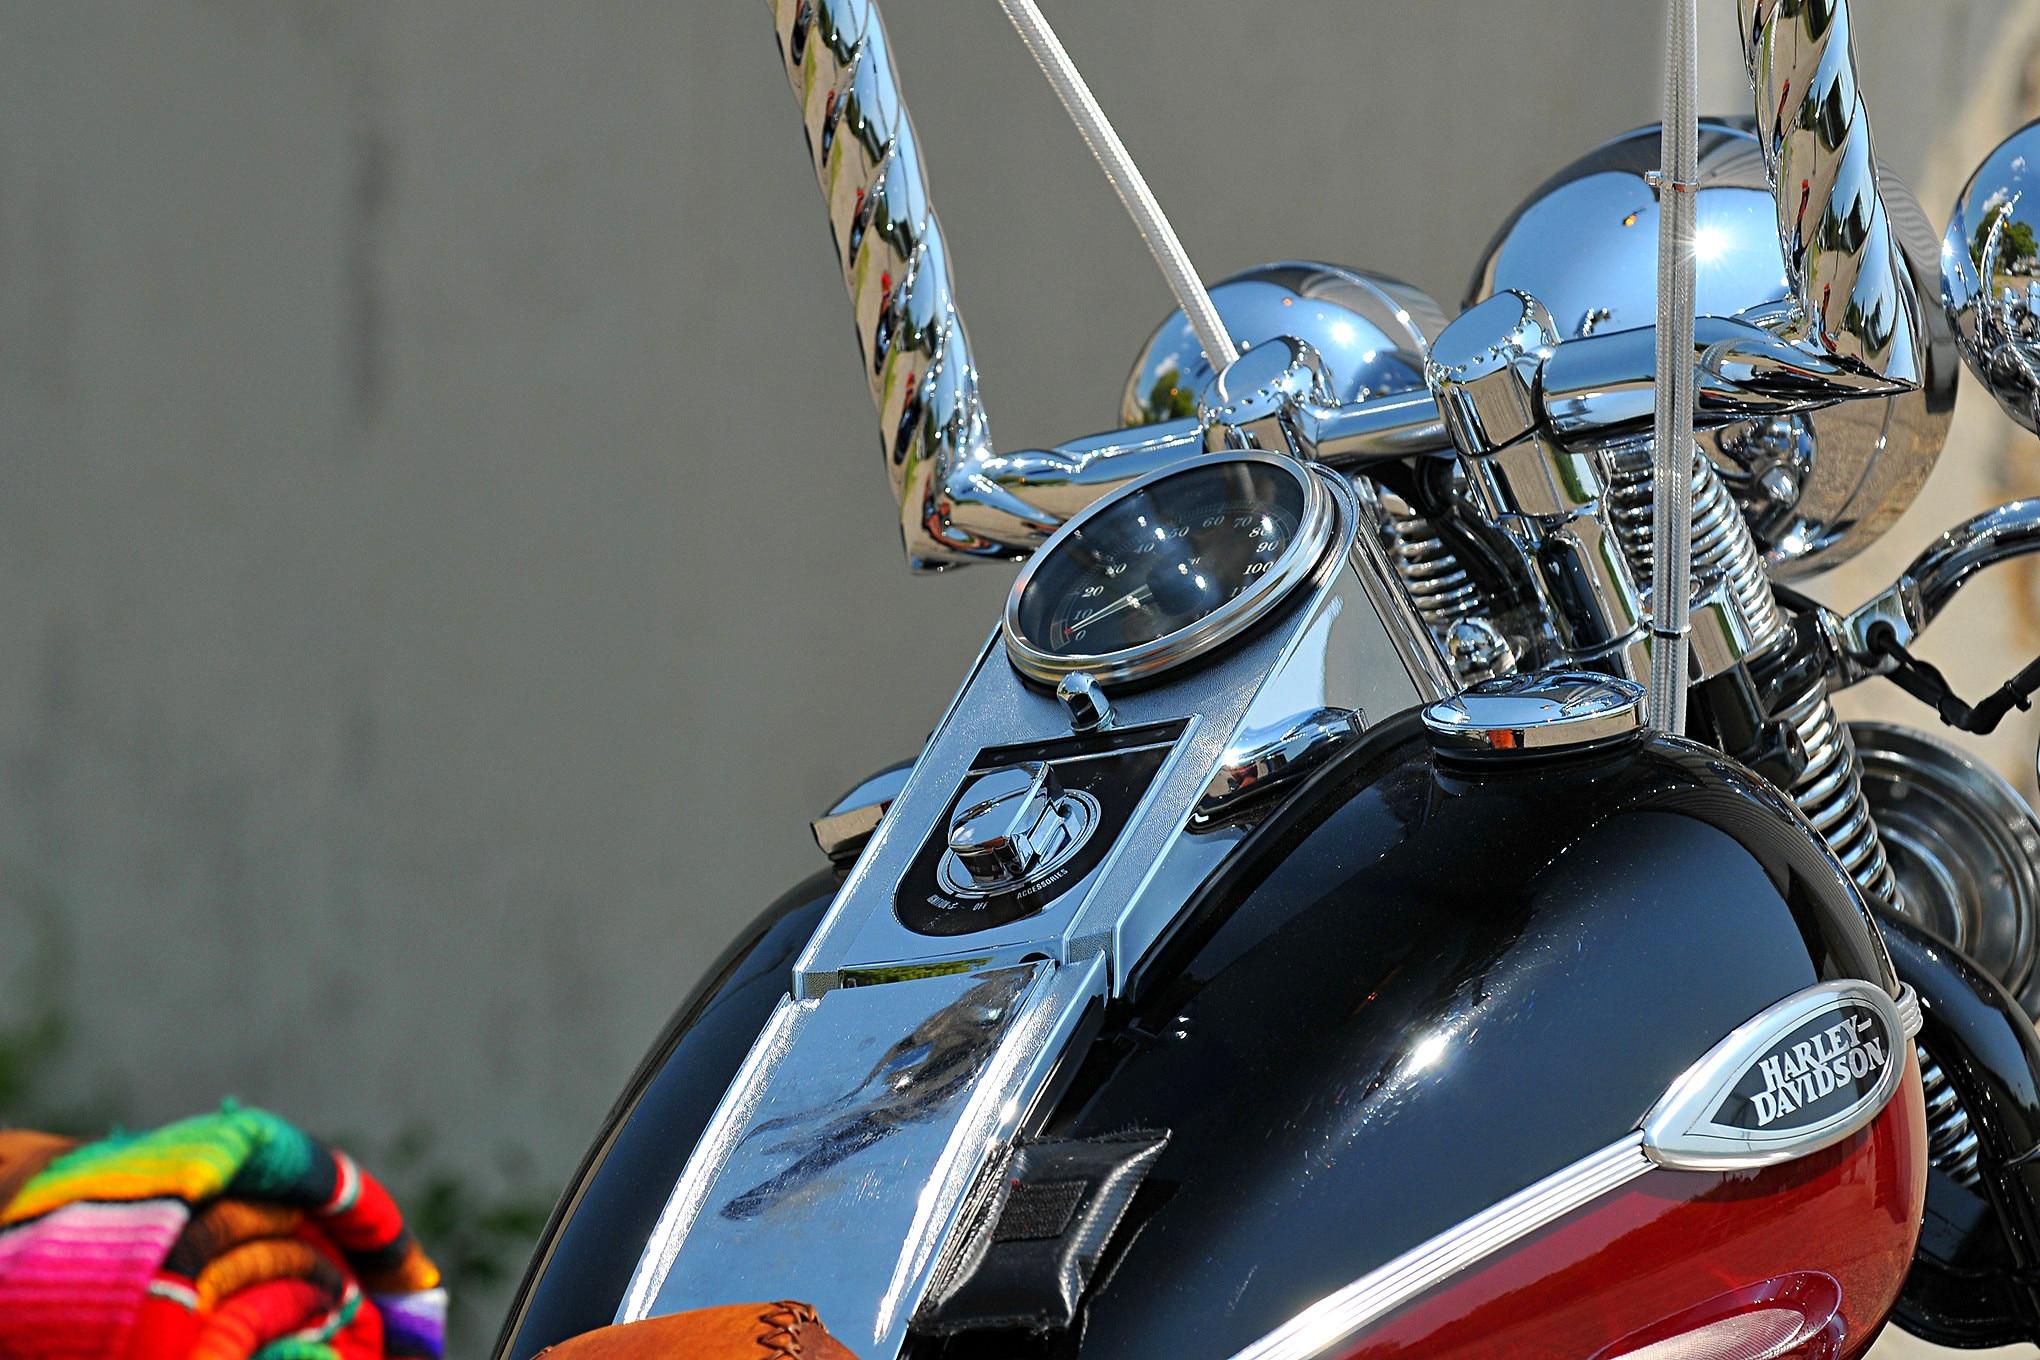 2005 Harley-Davidson Softail Springer - Hometown Hero